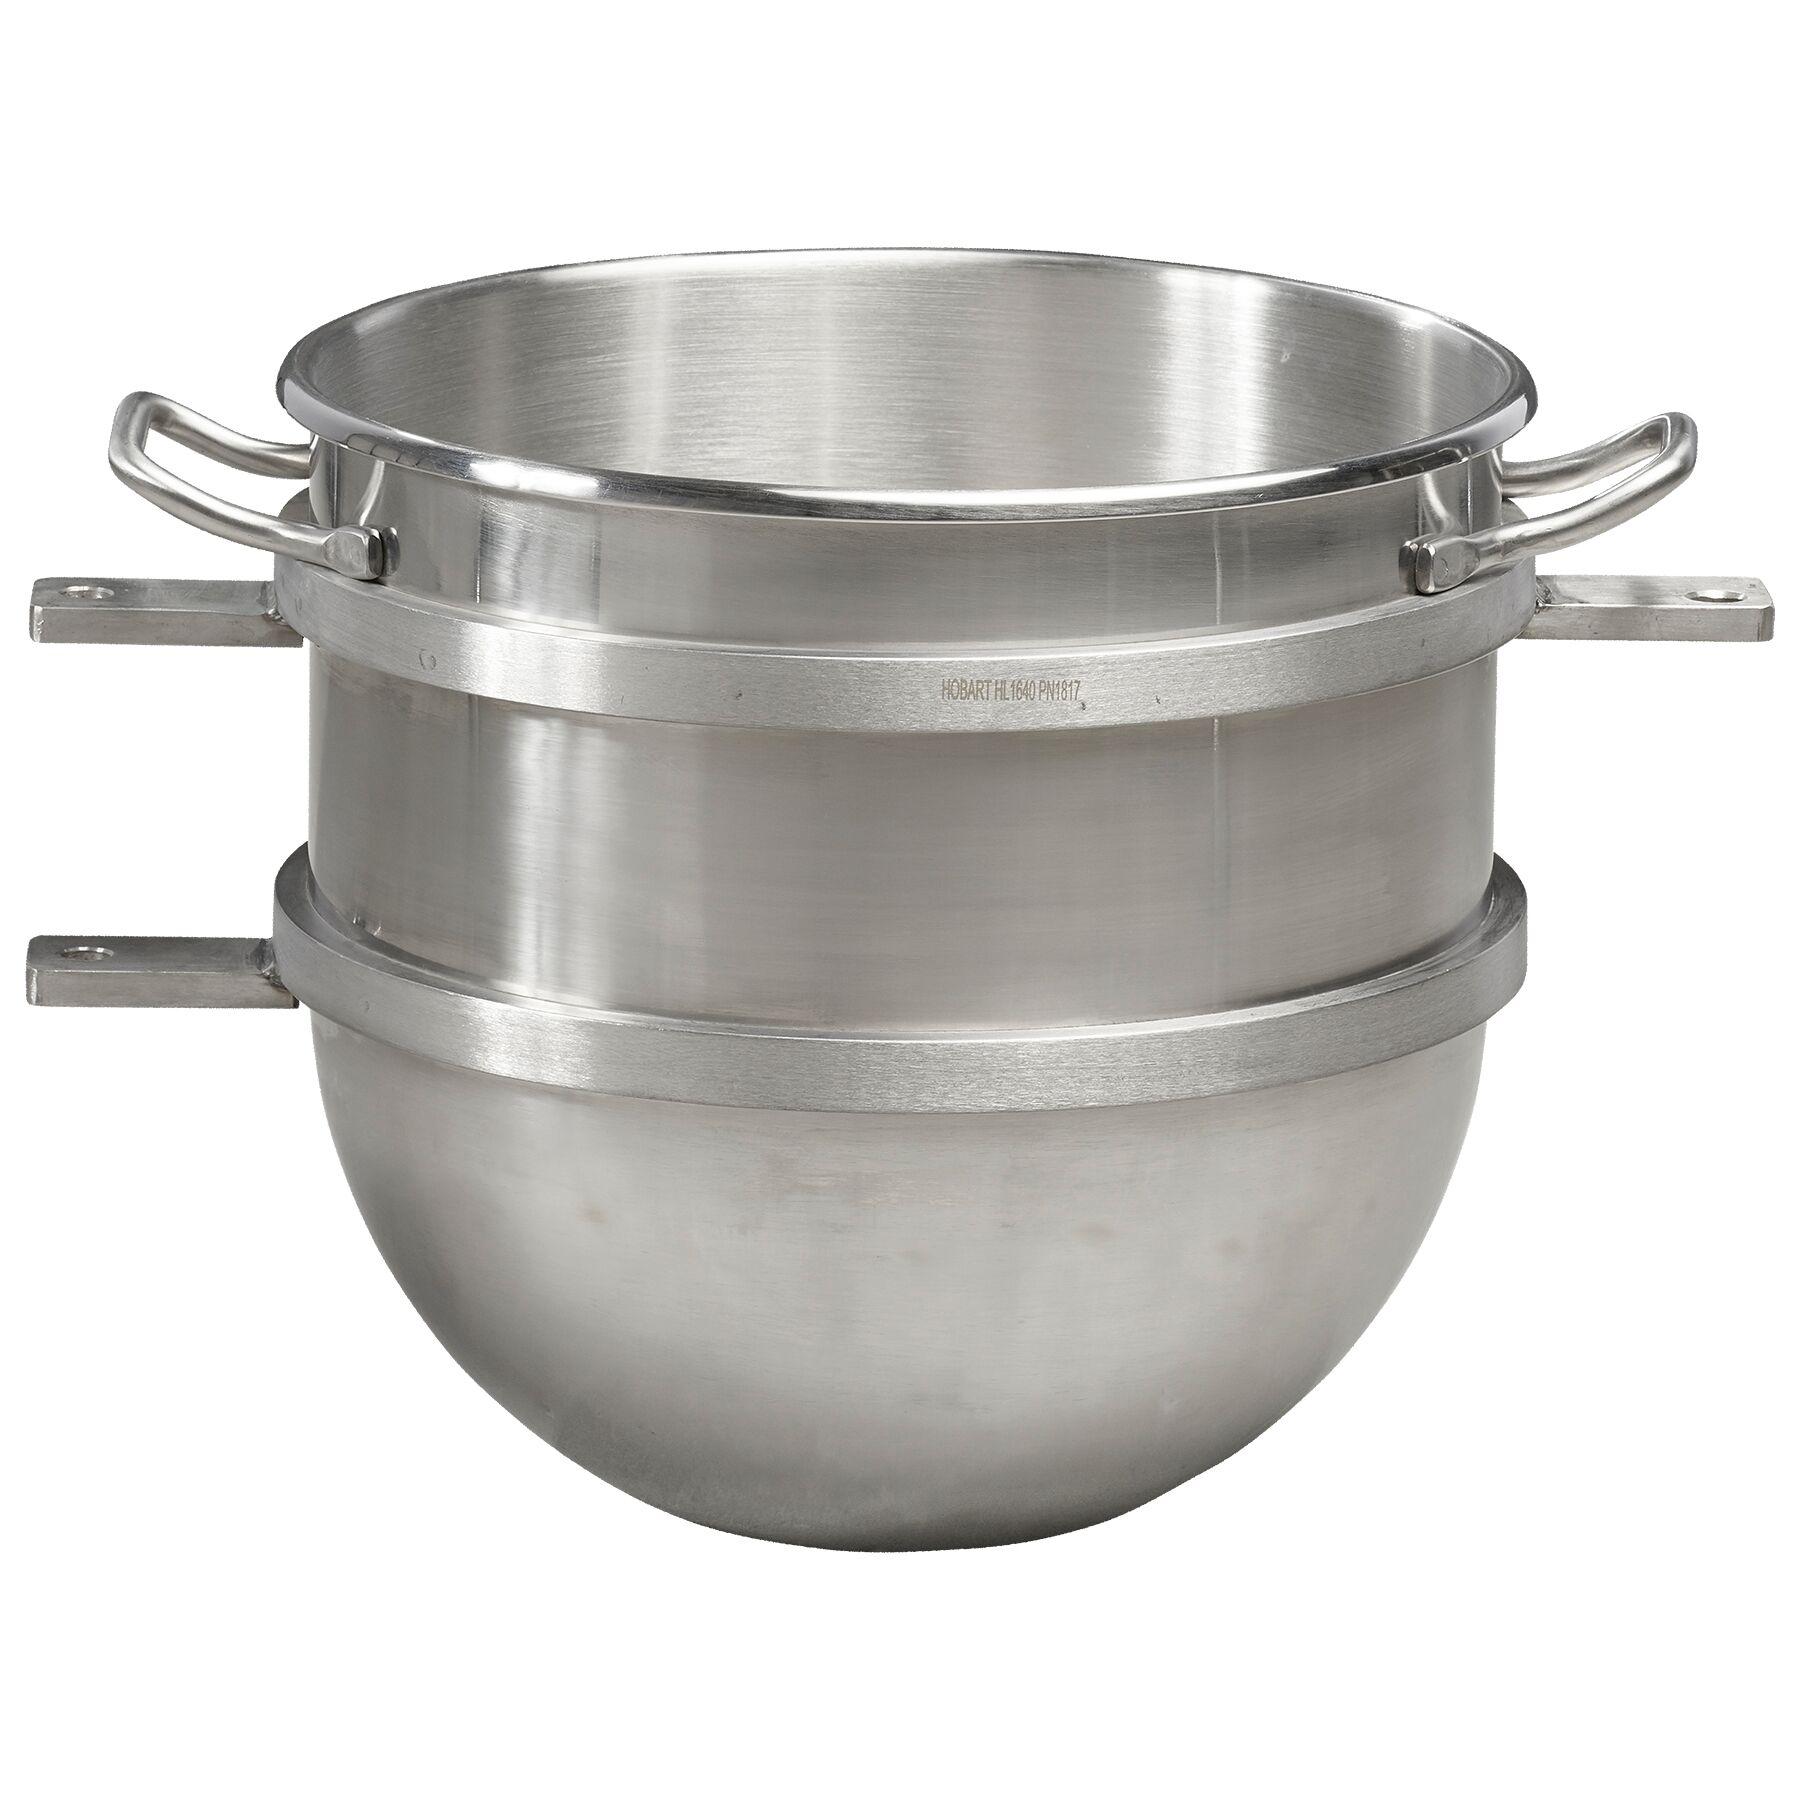 Hobart BOWL-HL30 mixer bowl